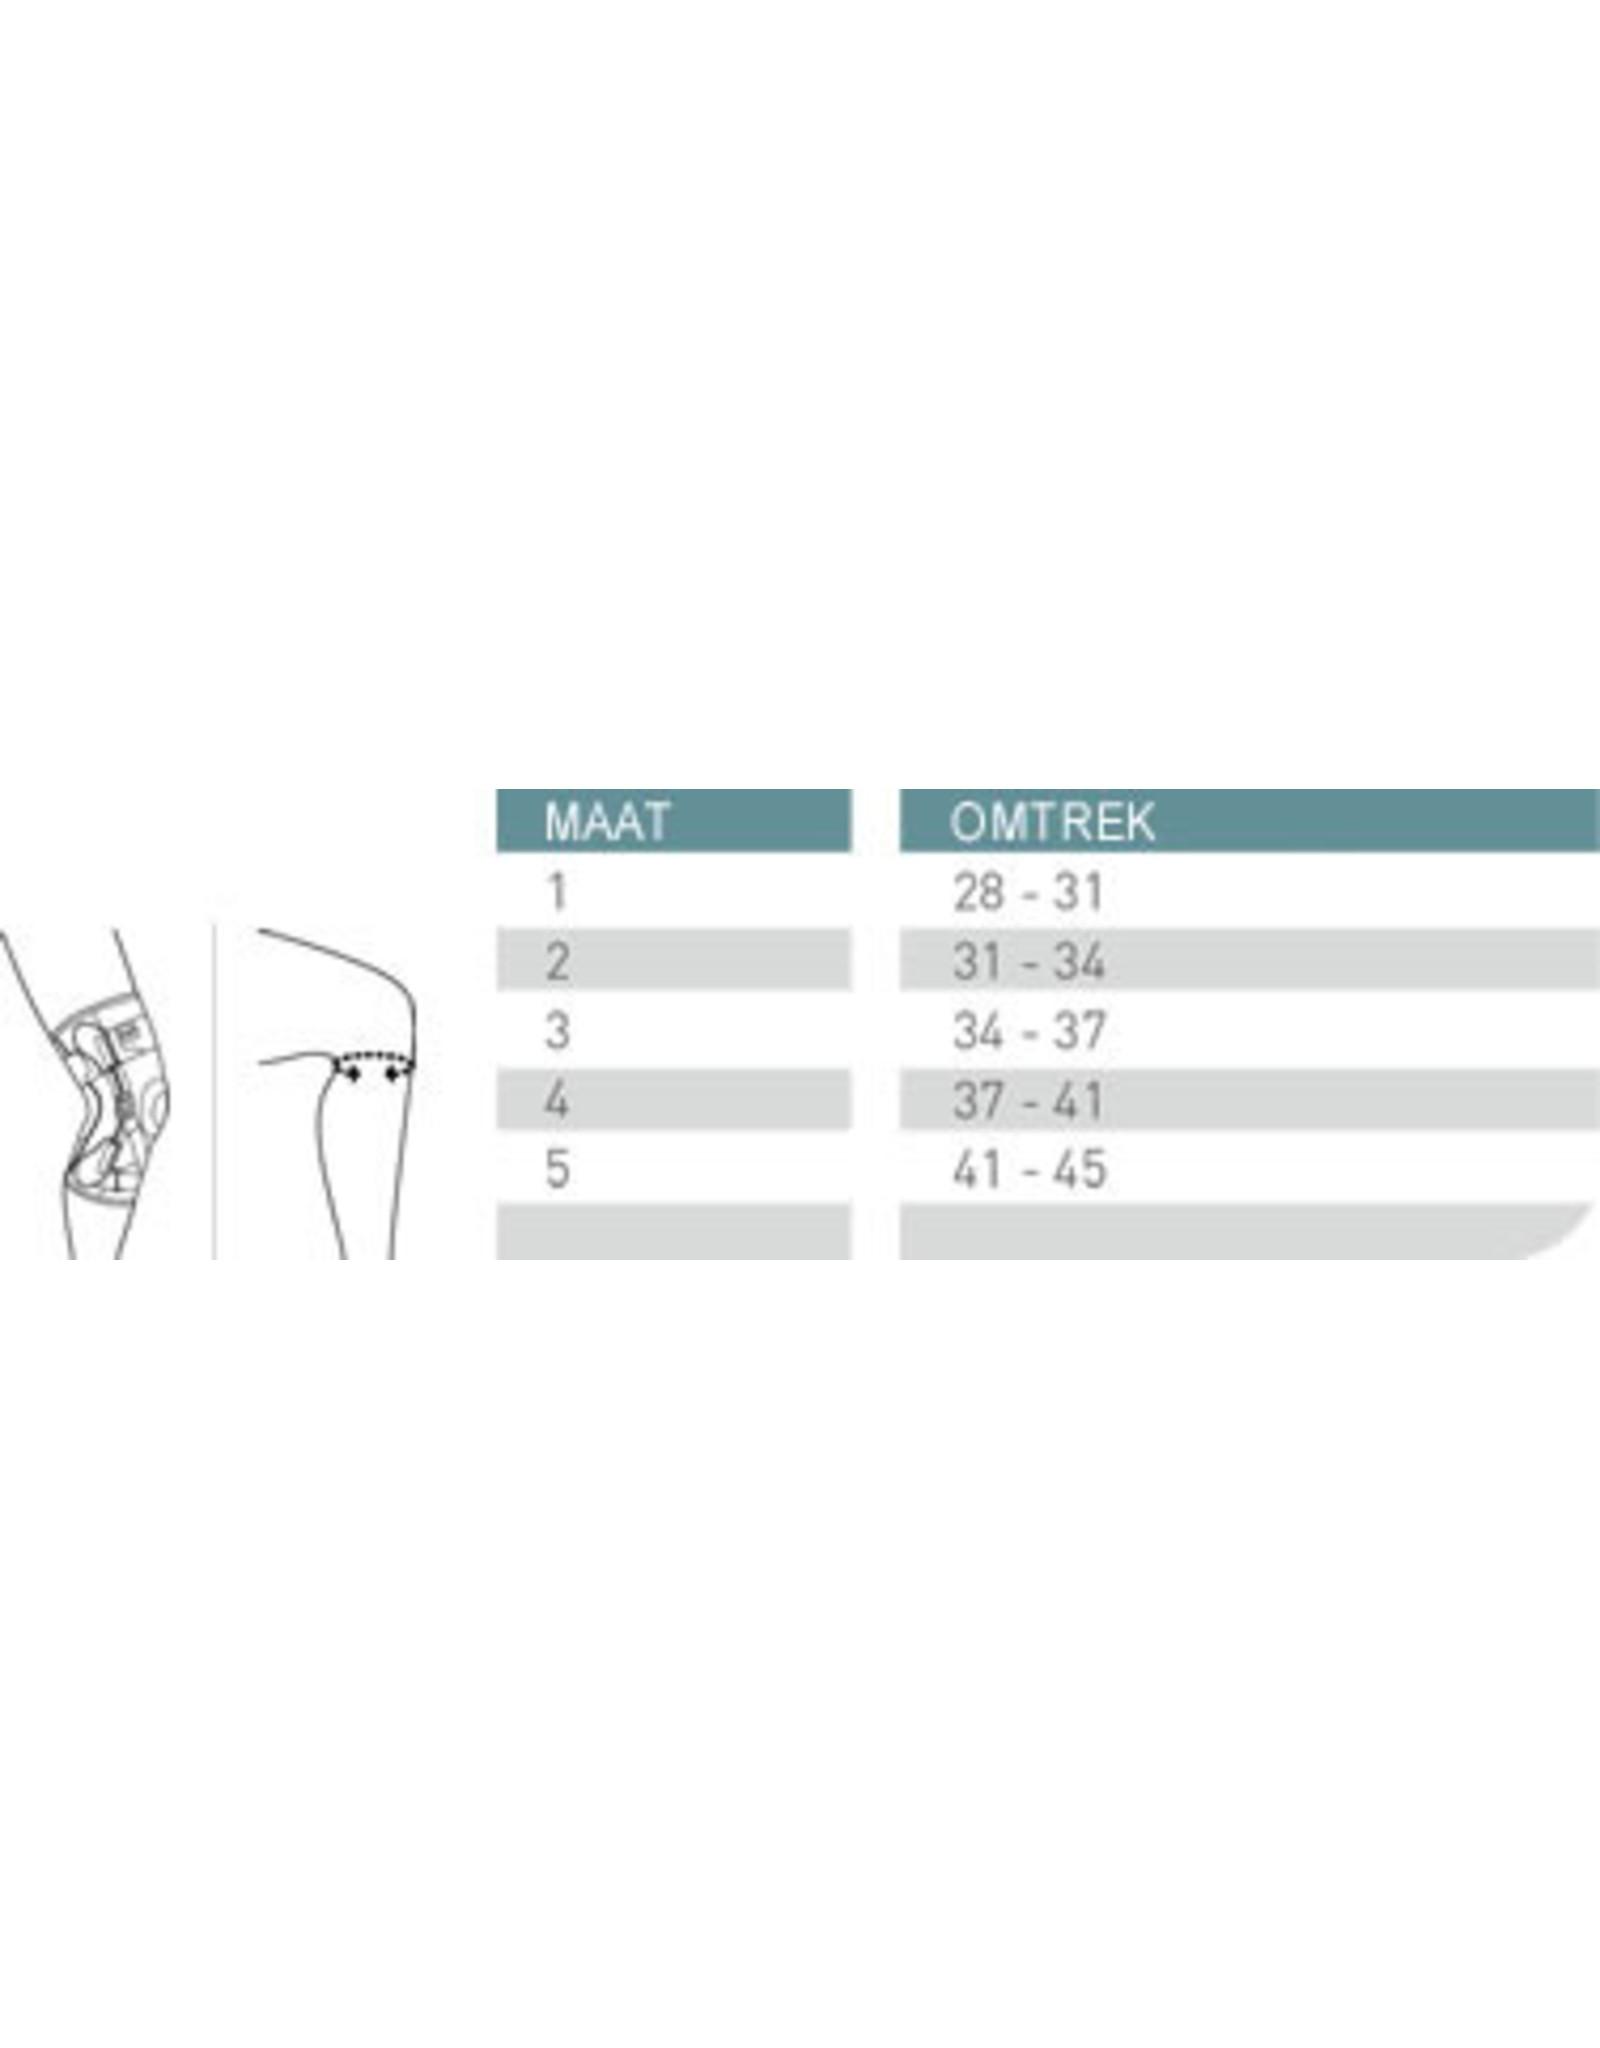 Push med knie brace